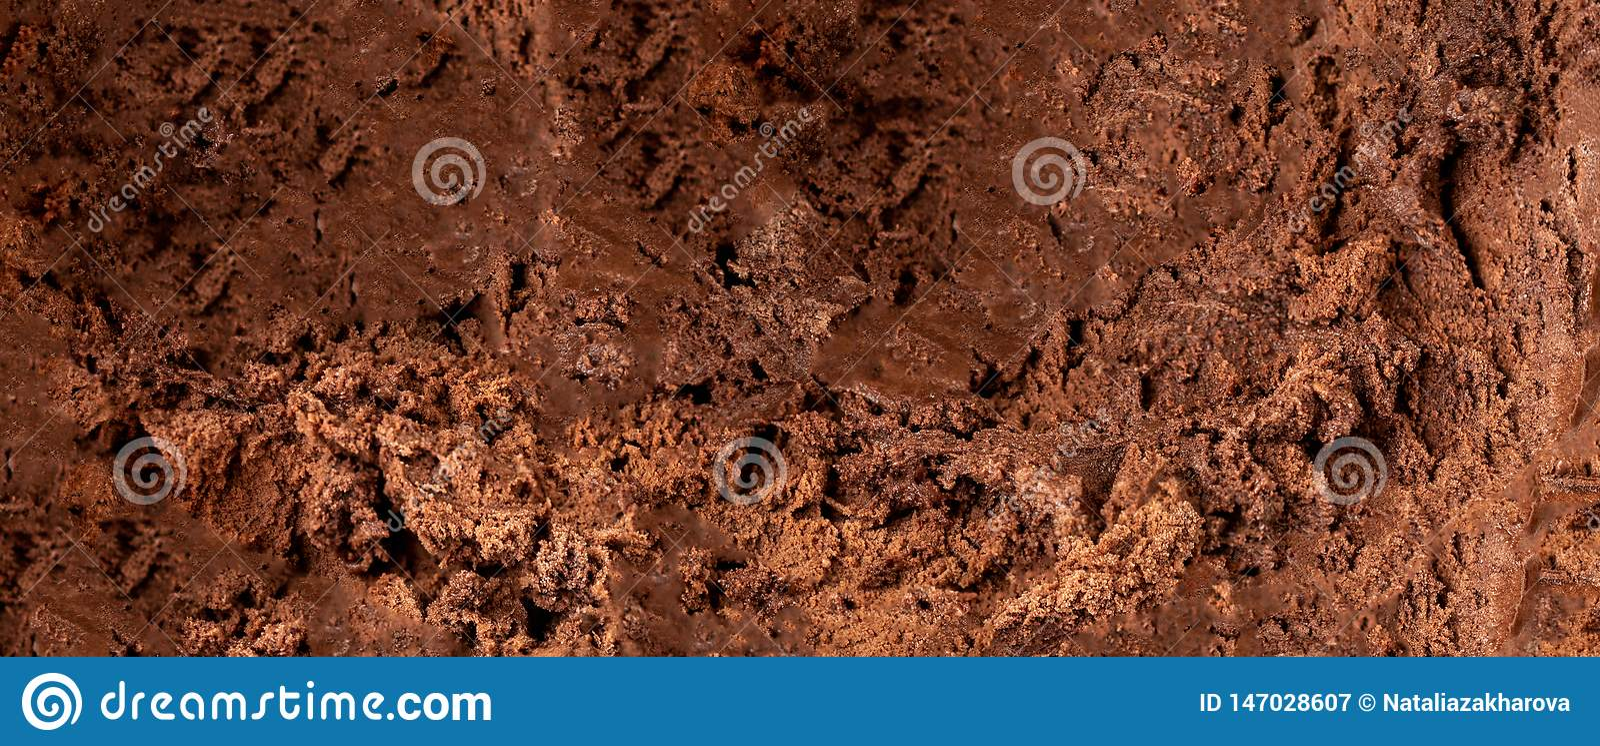 Dark Chocolate ice cream Background or Texture. Cocoa ice-cream wallpaper